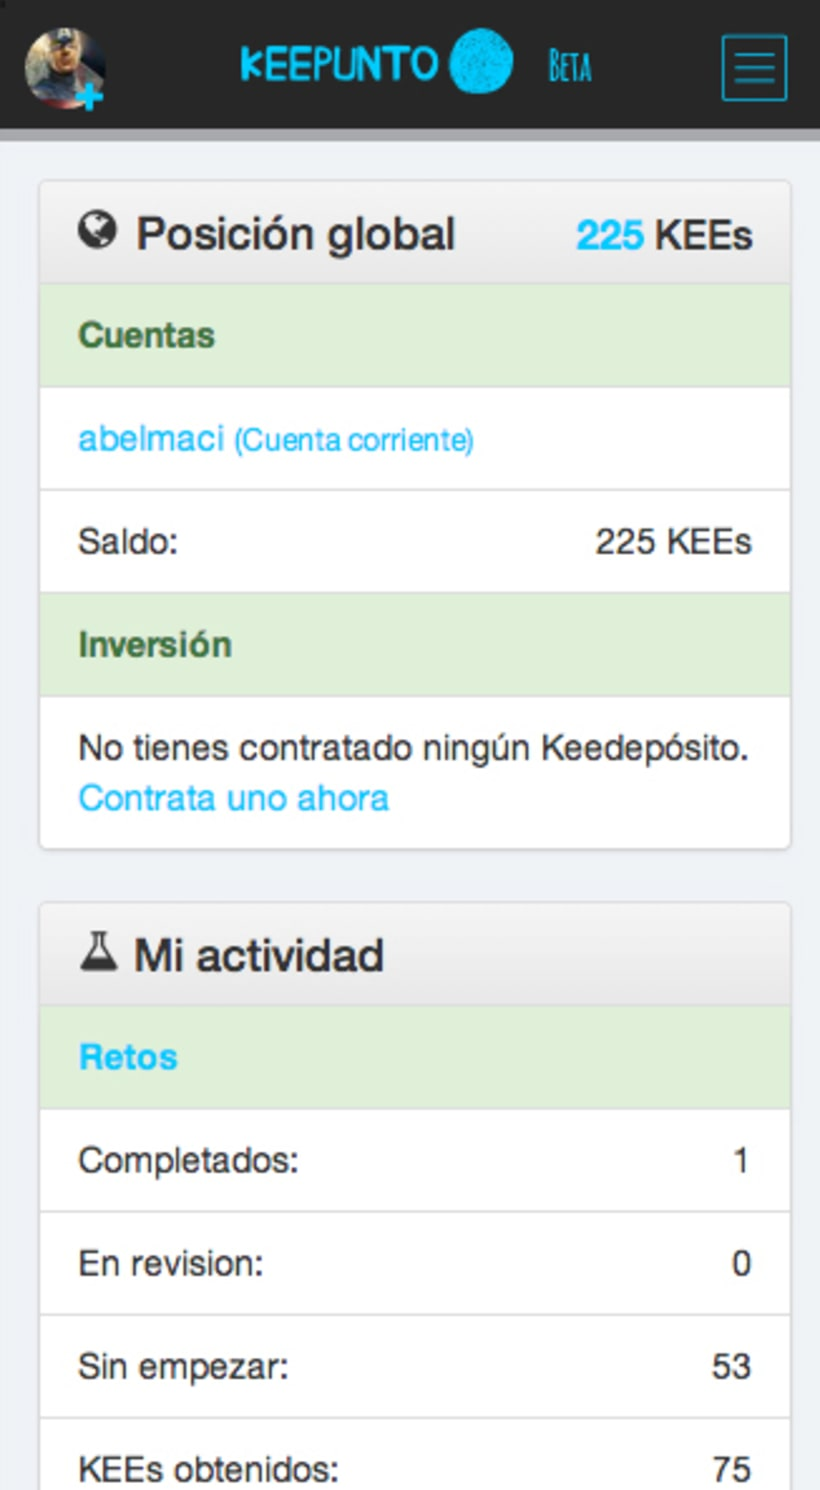 Keepunto Diseño Movil (web mobile) 6